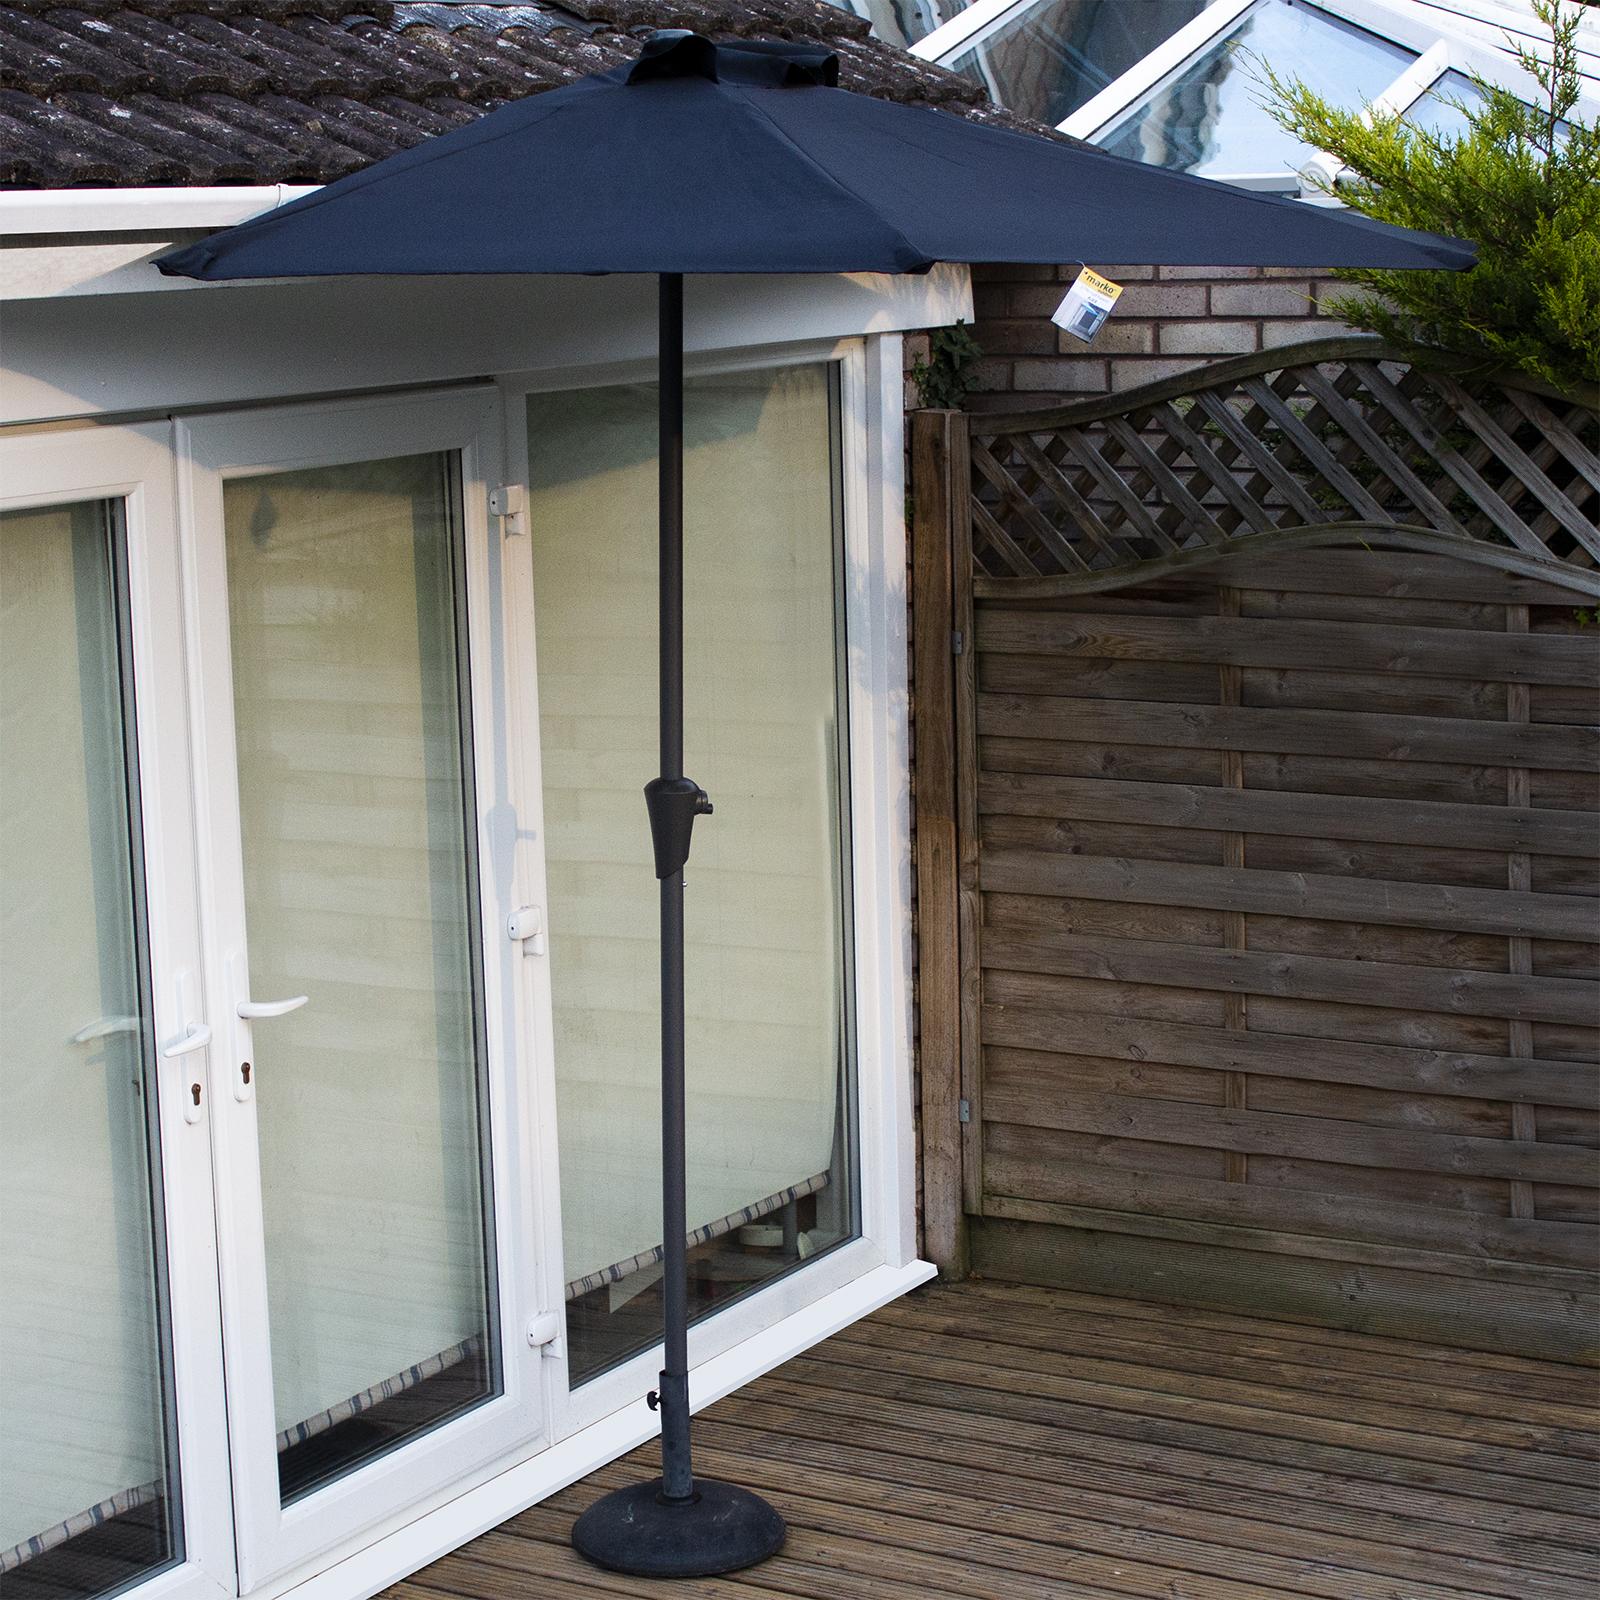 Details about 2 7M Half Round Parasols Umbrella Balcony Sunshade Outdoor  Garden Black Cream